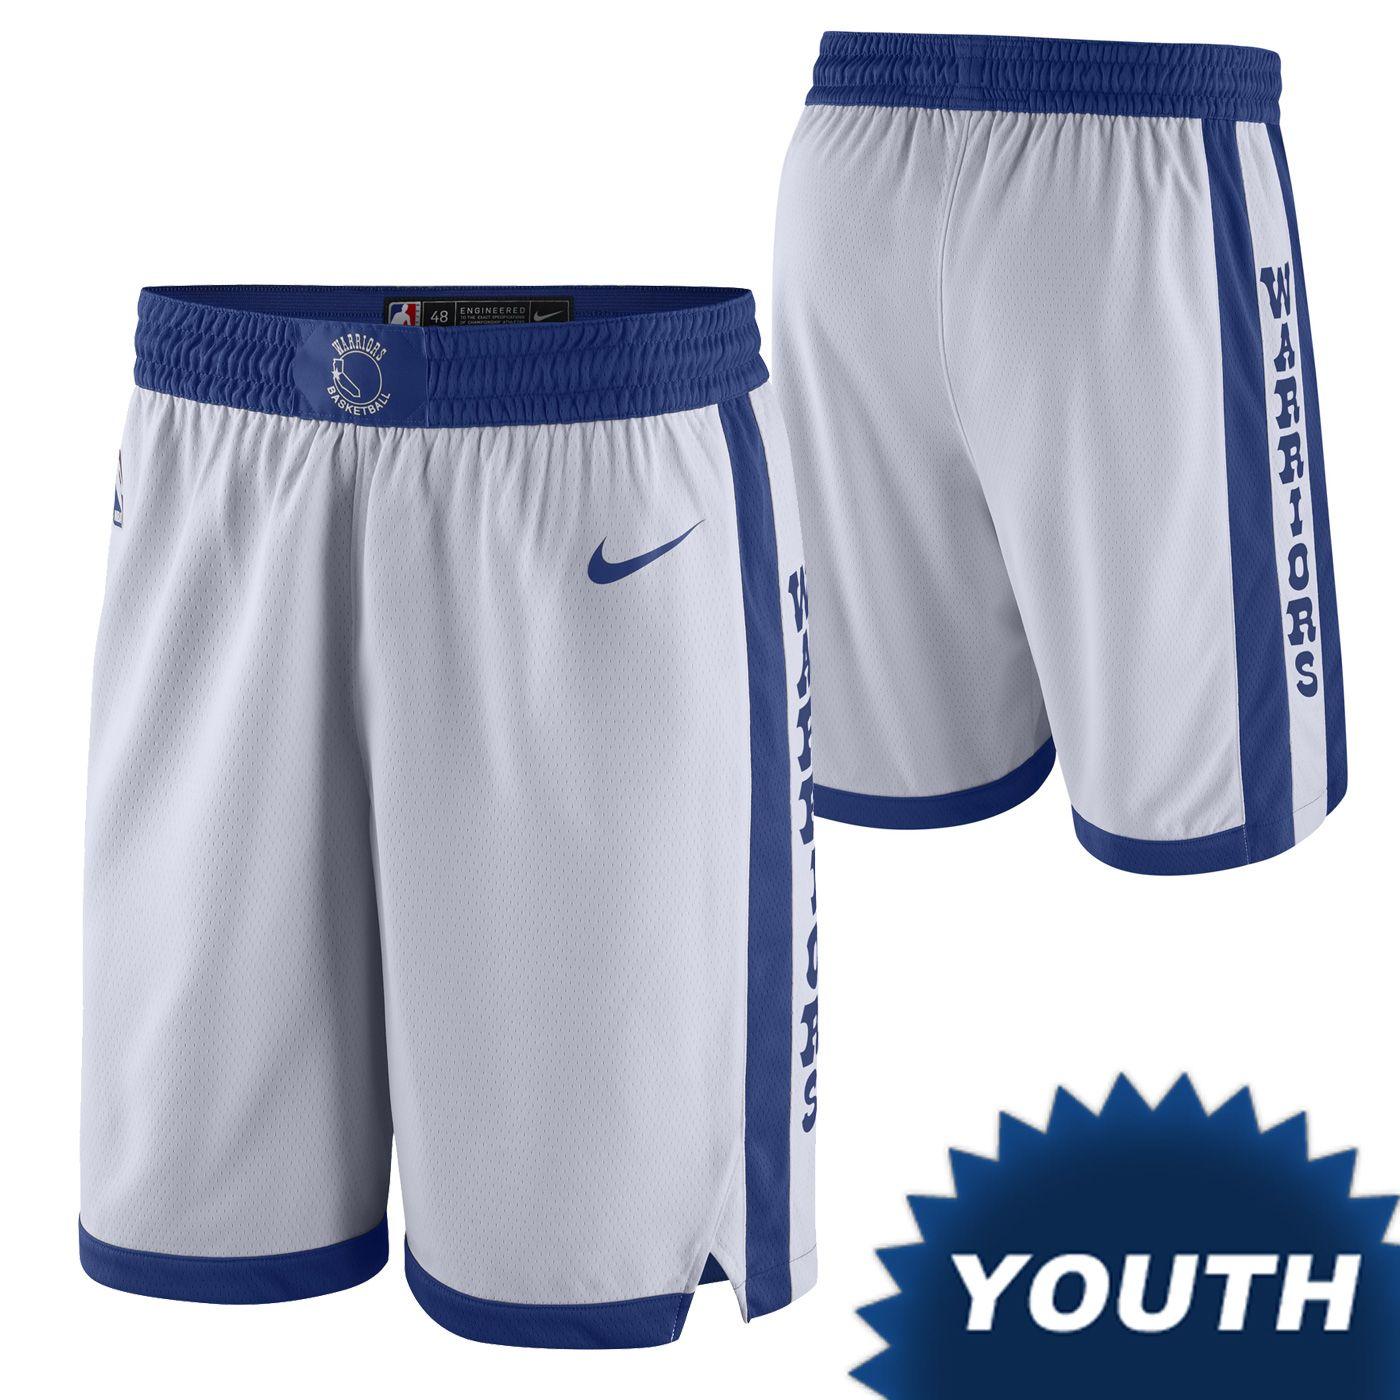 e9a0e590525 Golden State Warriors Nike Dri-FIT Youth Classic Edition Swingman Short -  White